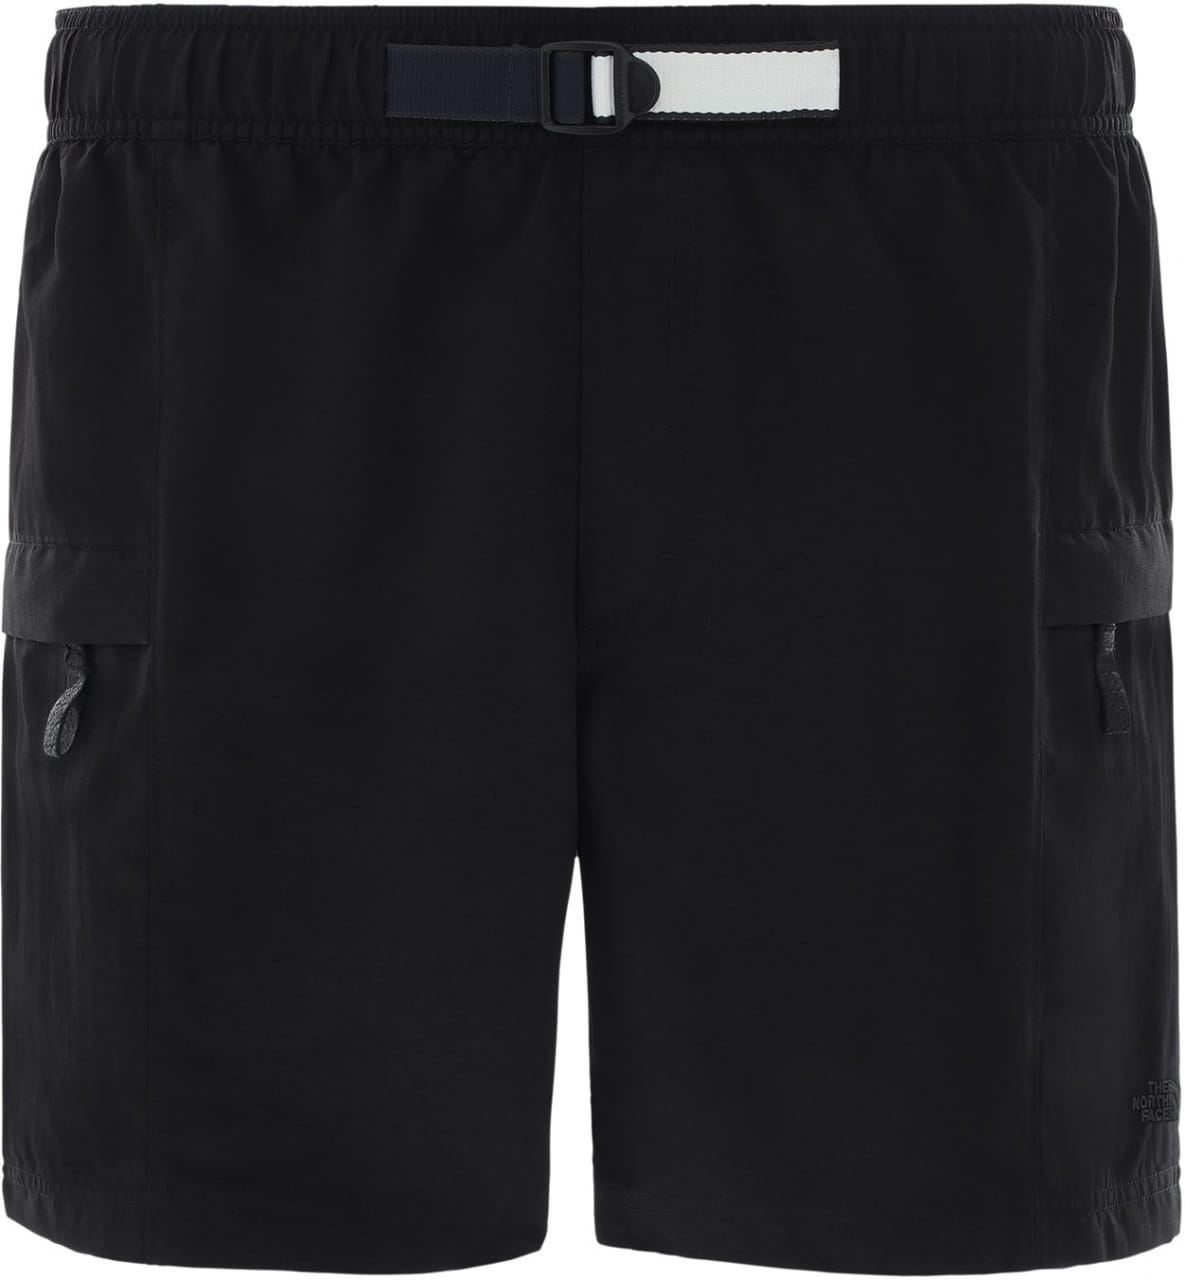 Shorts The North Face Men's Class V Water Shorts